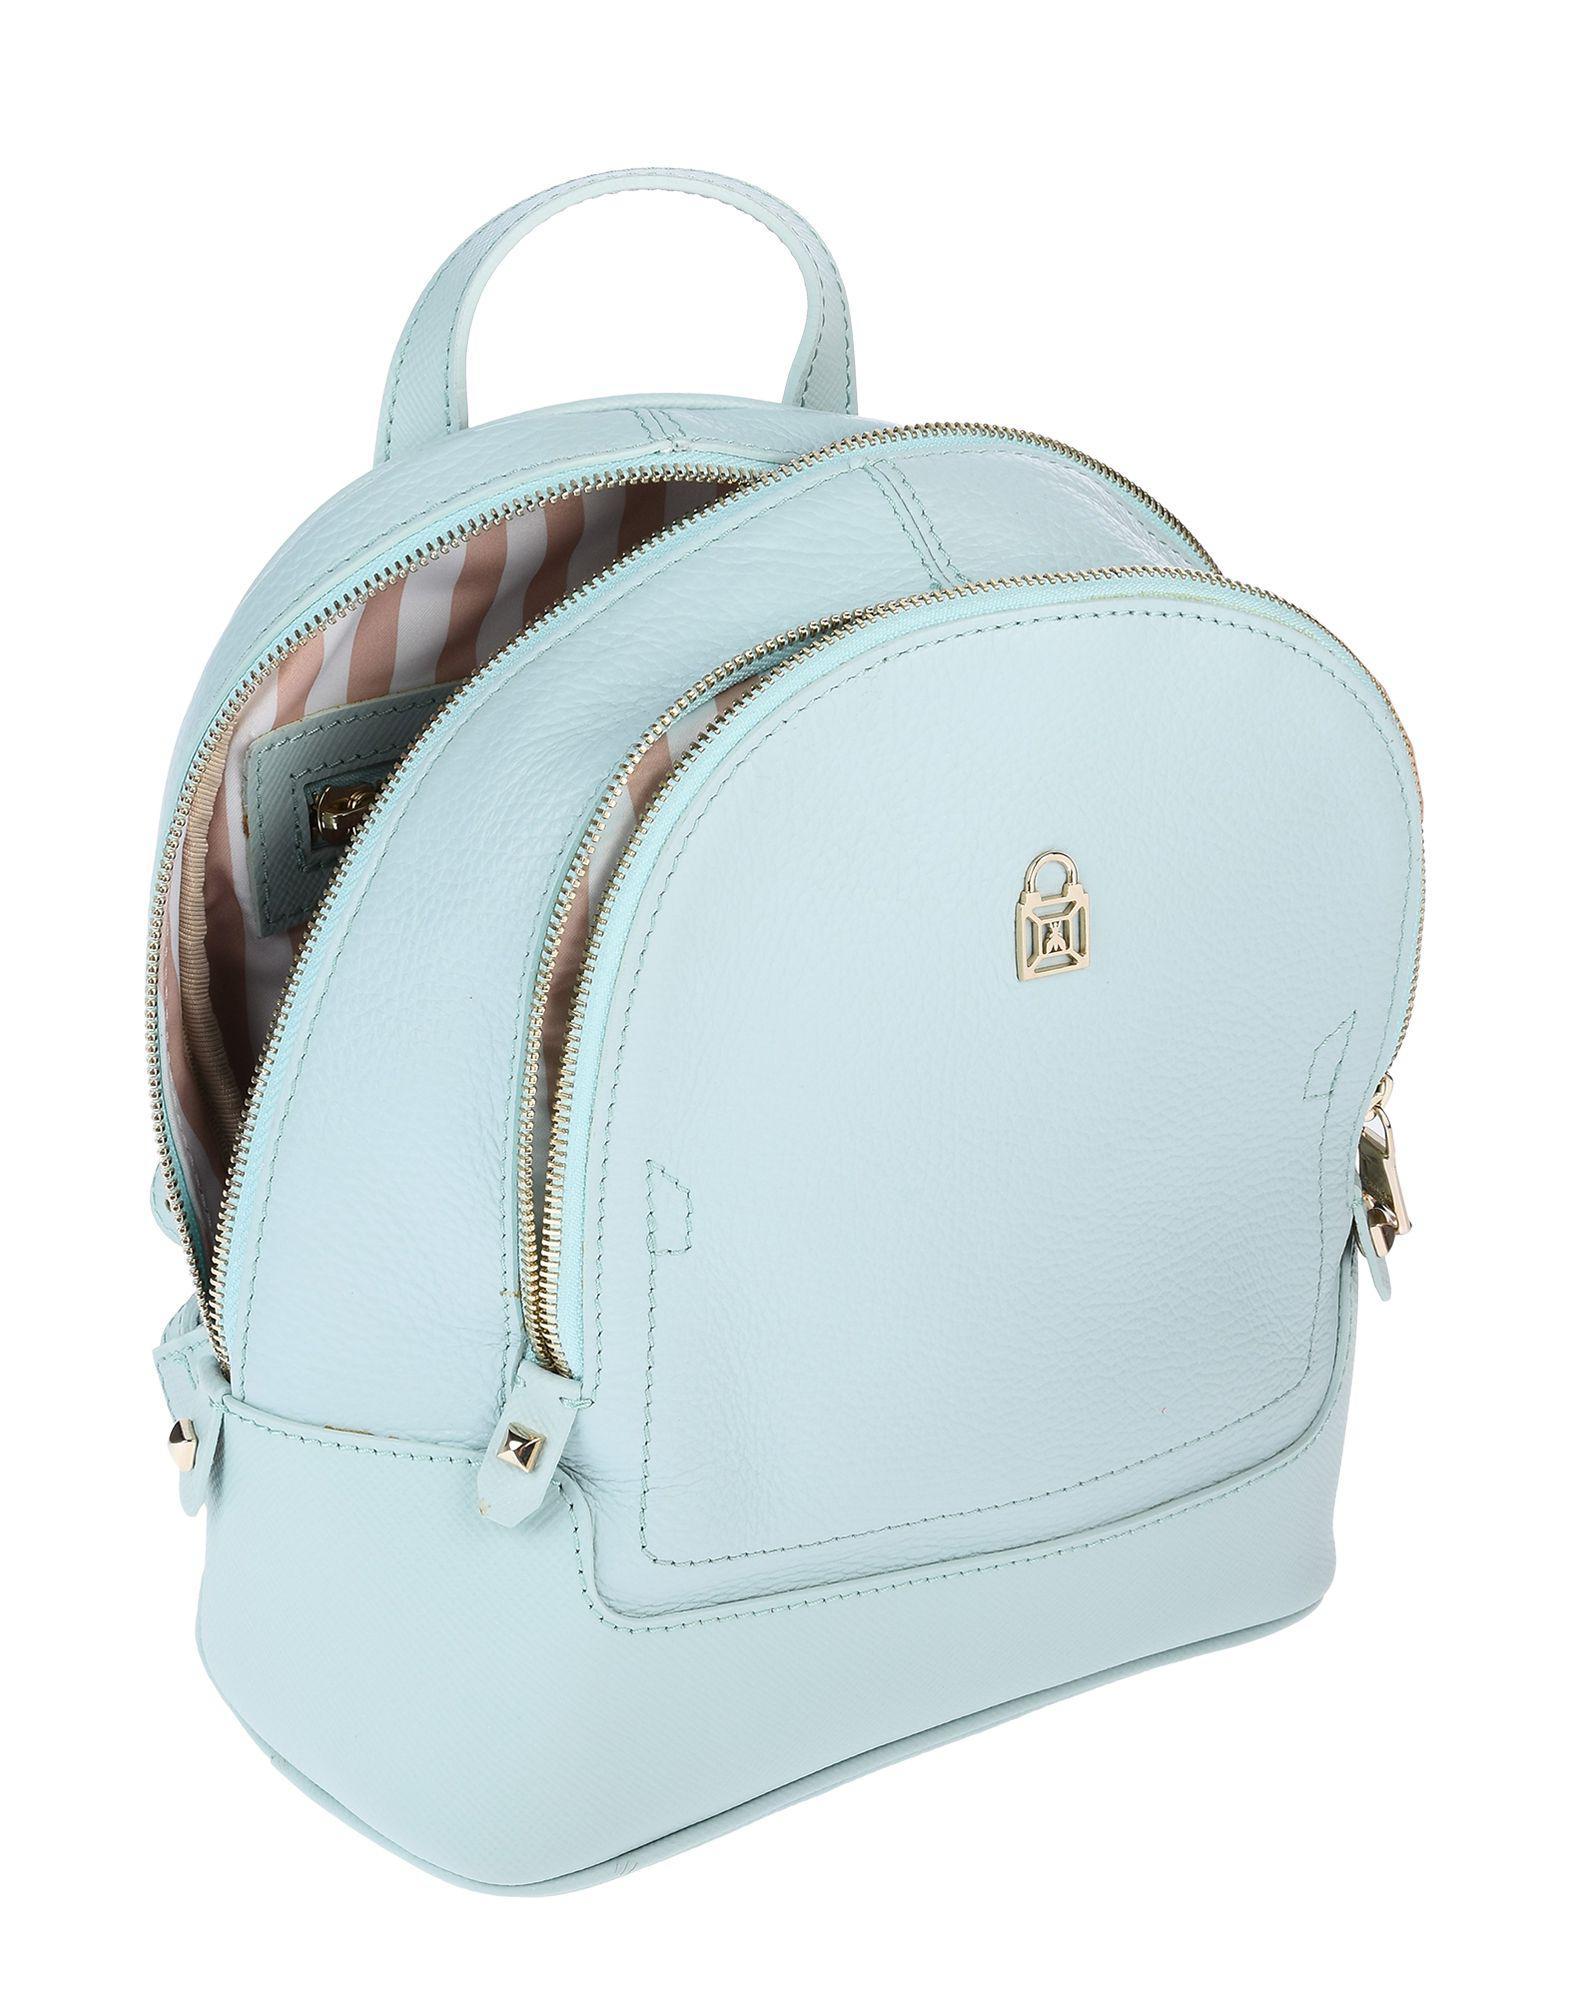 Lyst Patrizia Backpacks In Bum amp; Bags Blue Pepe HHqRAxr